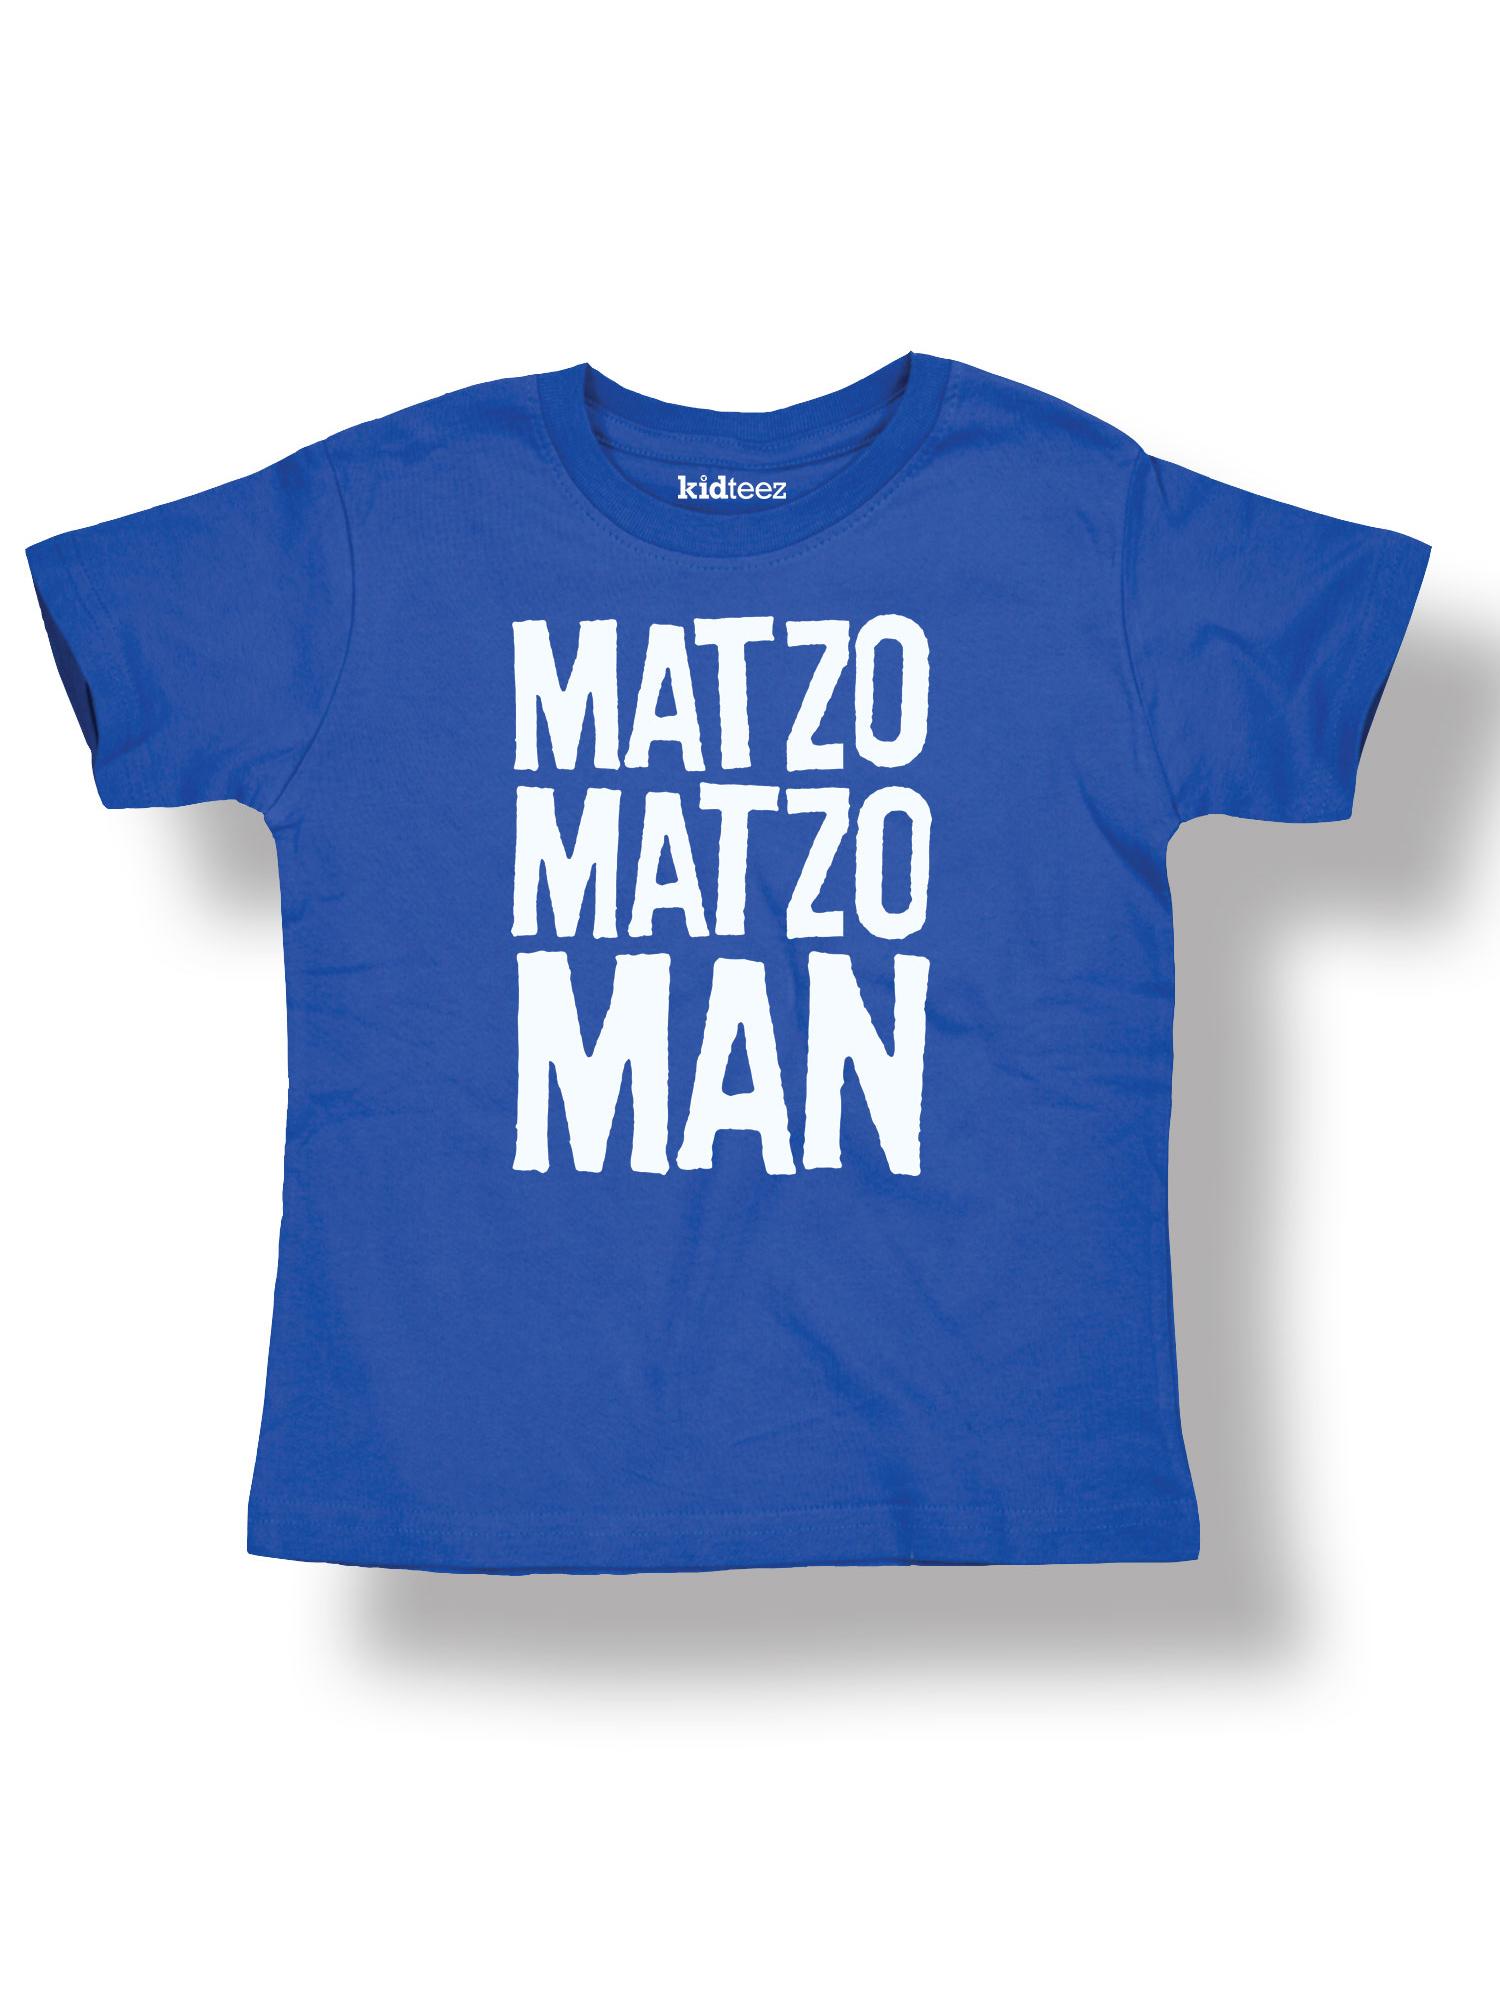 Matzo Matzo Man Cool Holiday Jewish-Toddler T-Shirt